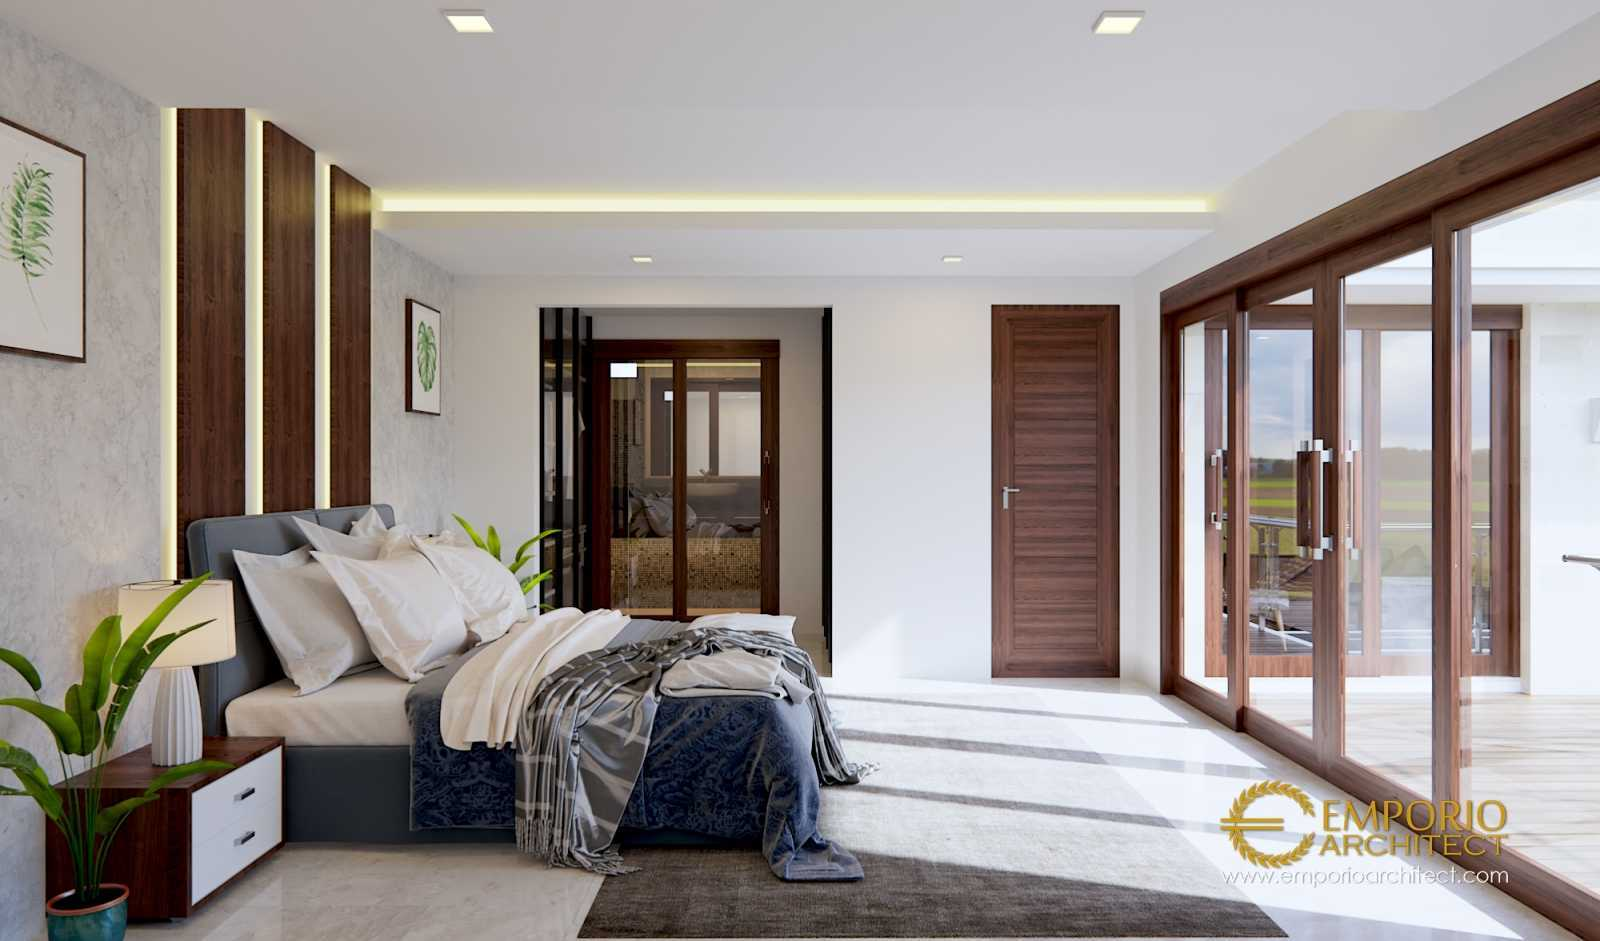 Emporio Architect Desain Rumah Modern Tropis 485 @ Manado Kota Manado, Sulawesi Utara, Indonesia Kota Manado, Sulawesi Utara, Indonesia Emporio-Architect-Desain-Rumah-Modern-Tropis-485-Manado  77279